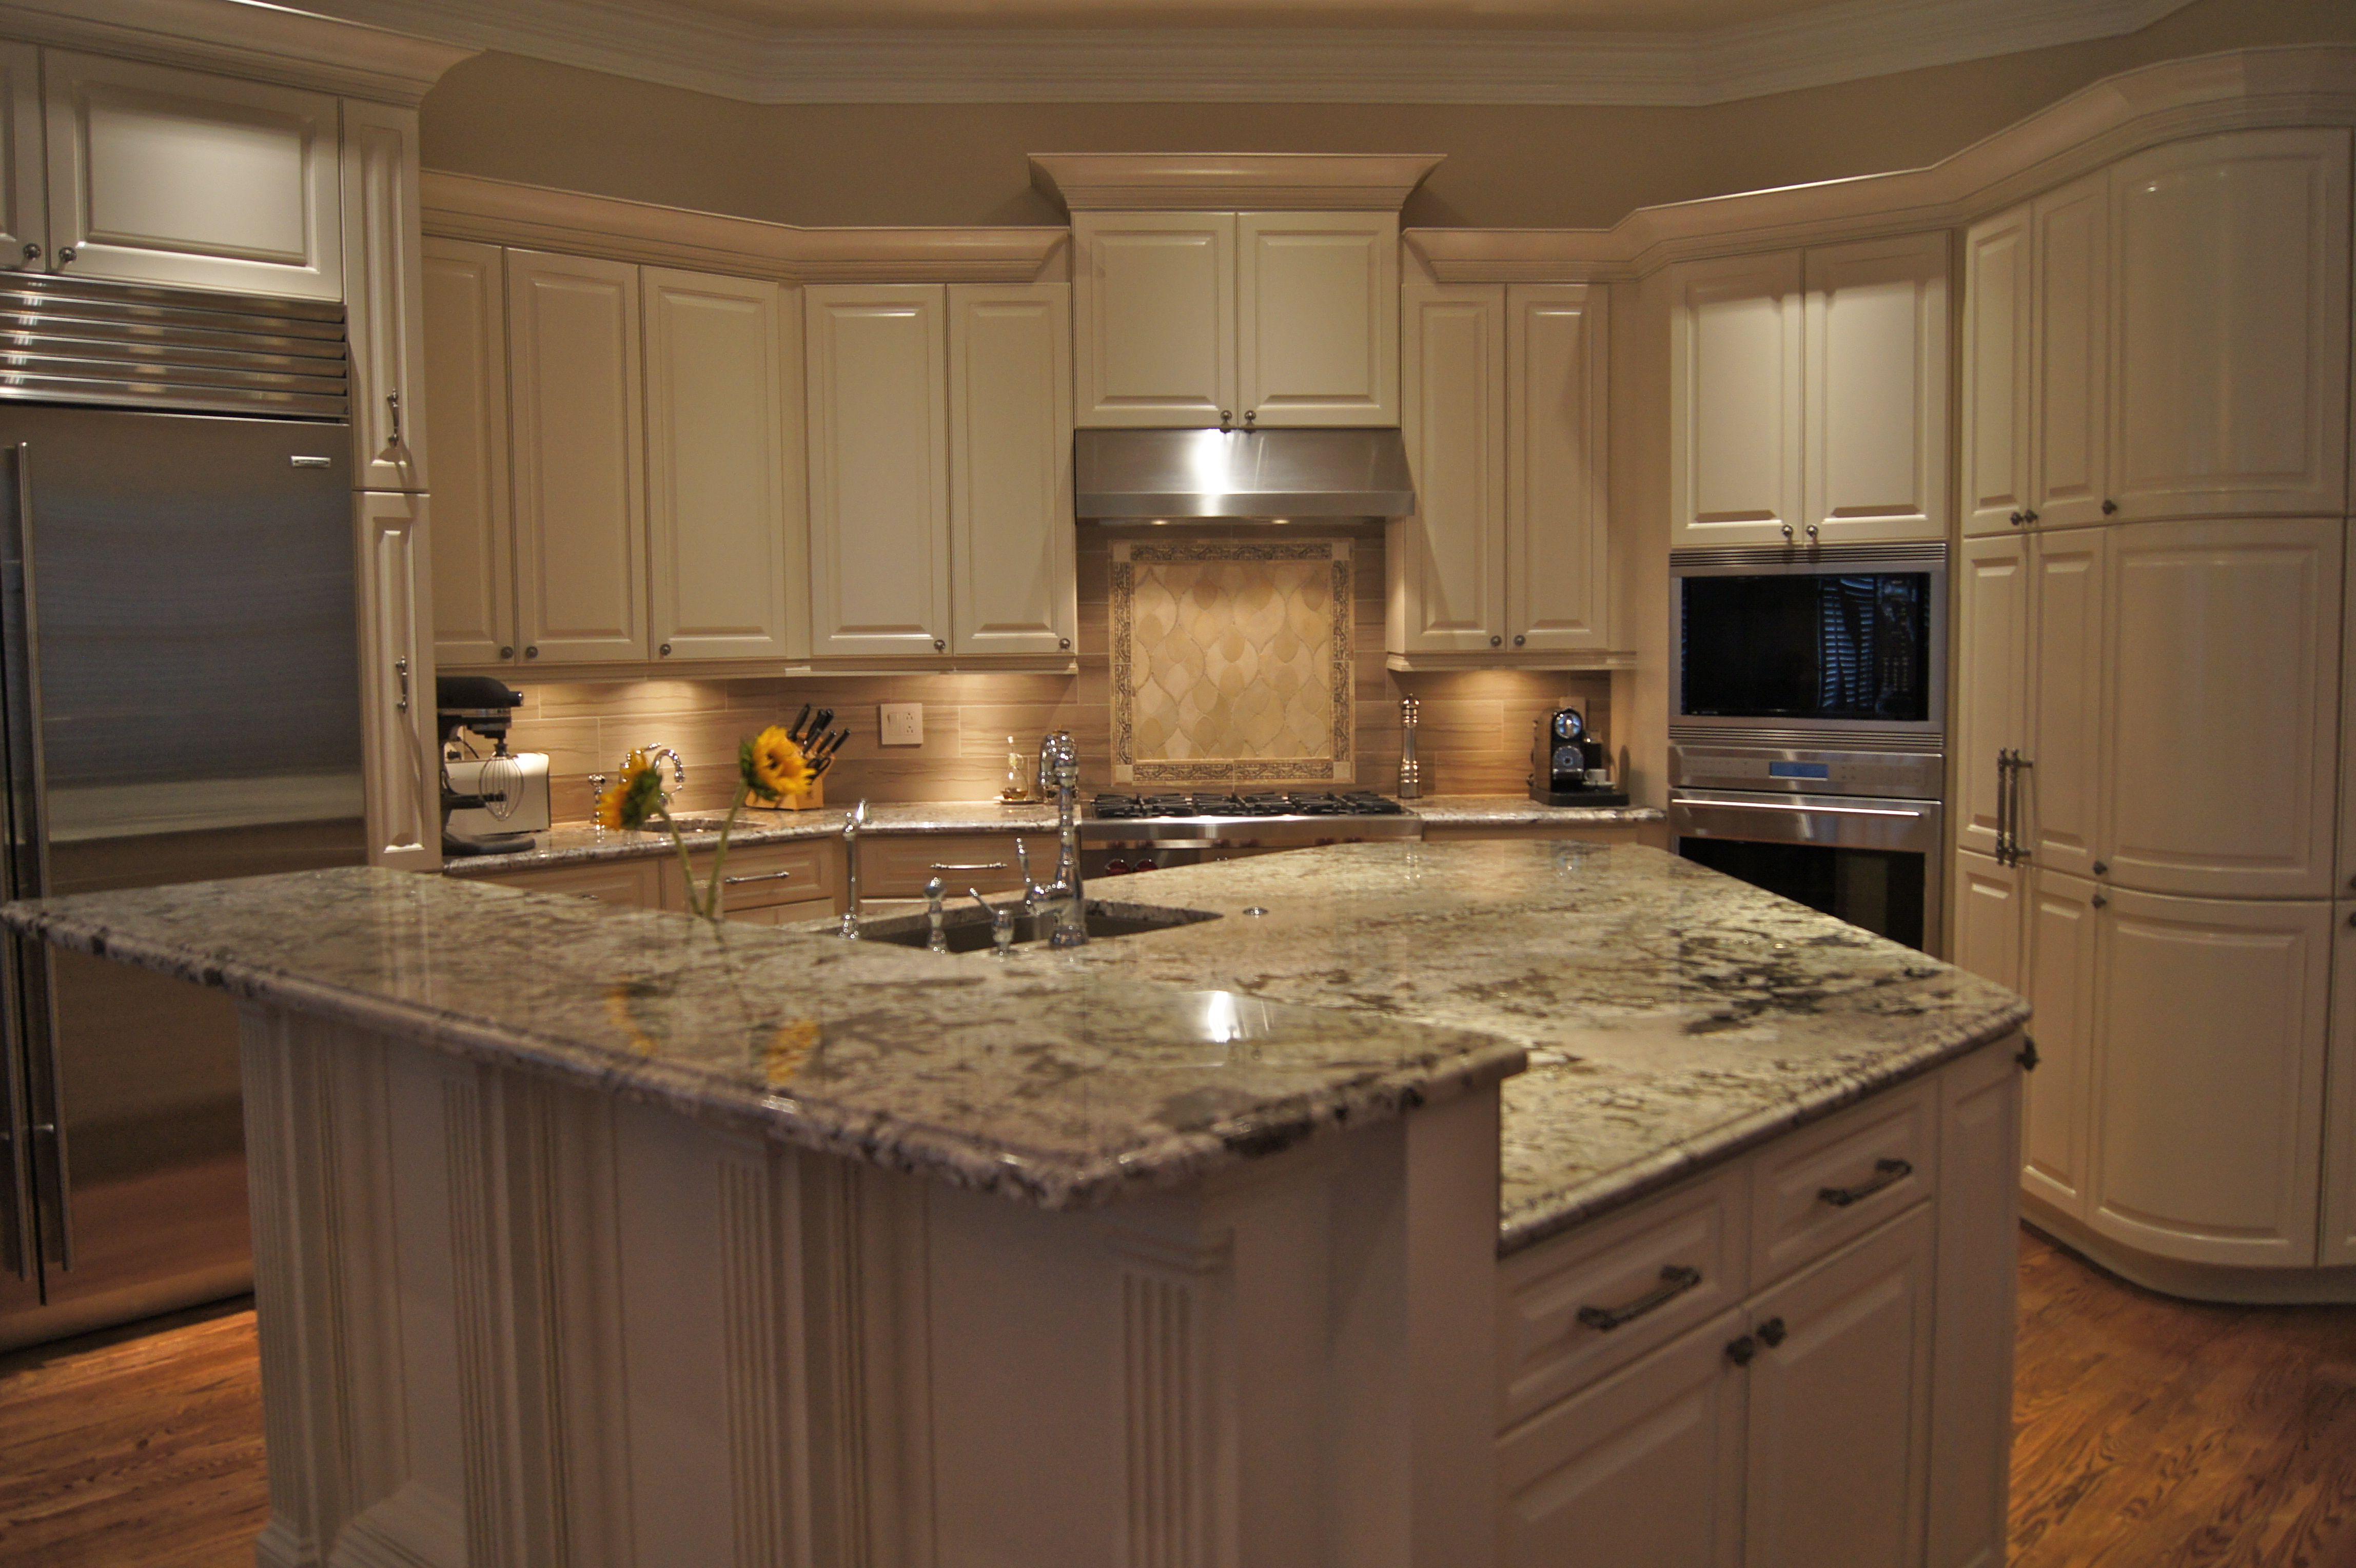 Home | Kitchen remodel, Kitchen, bath remodeling, Kitchen